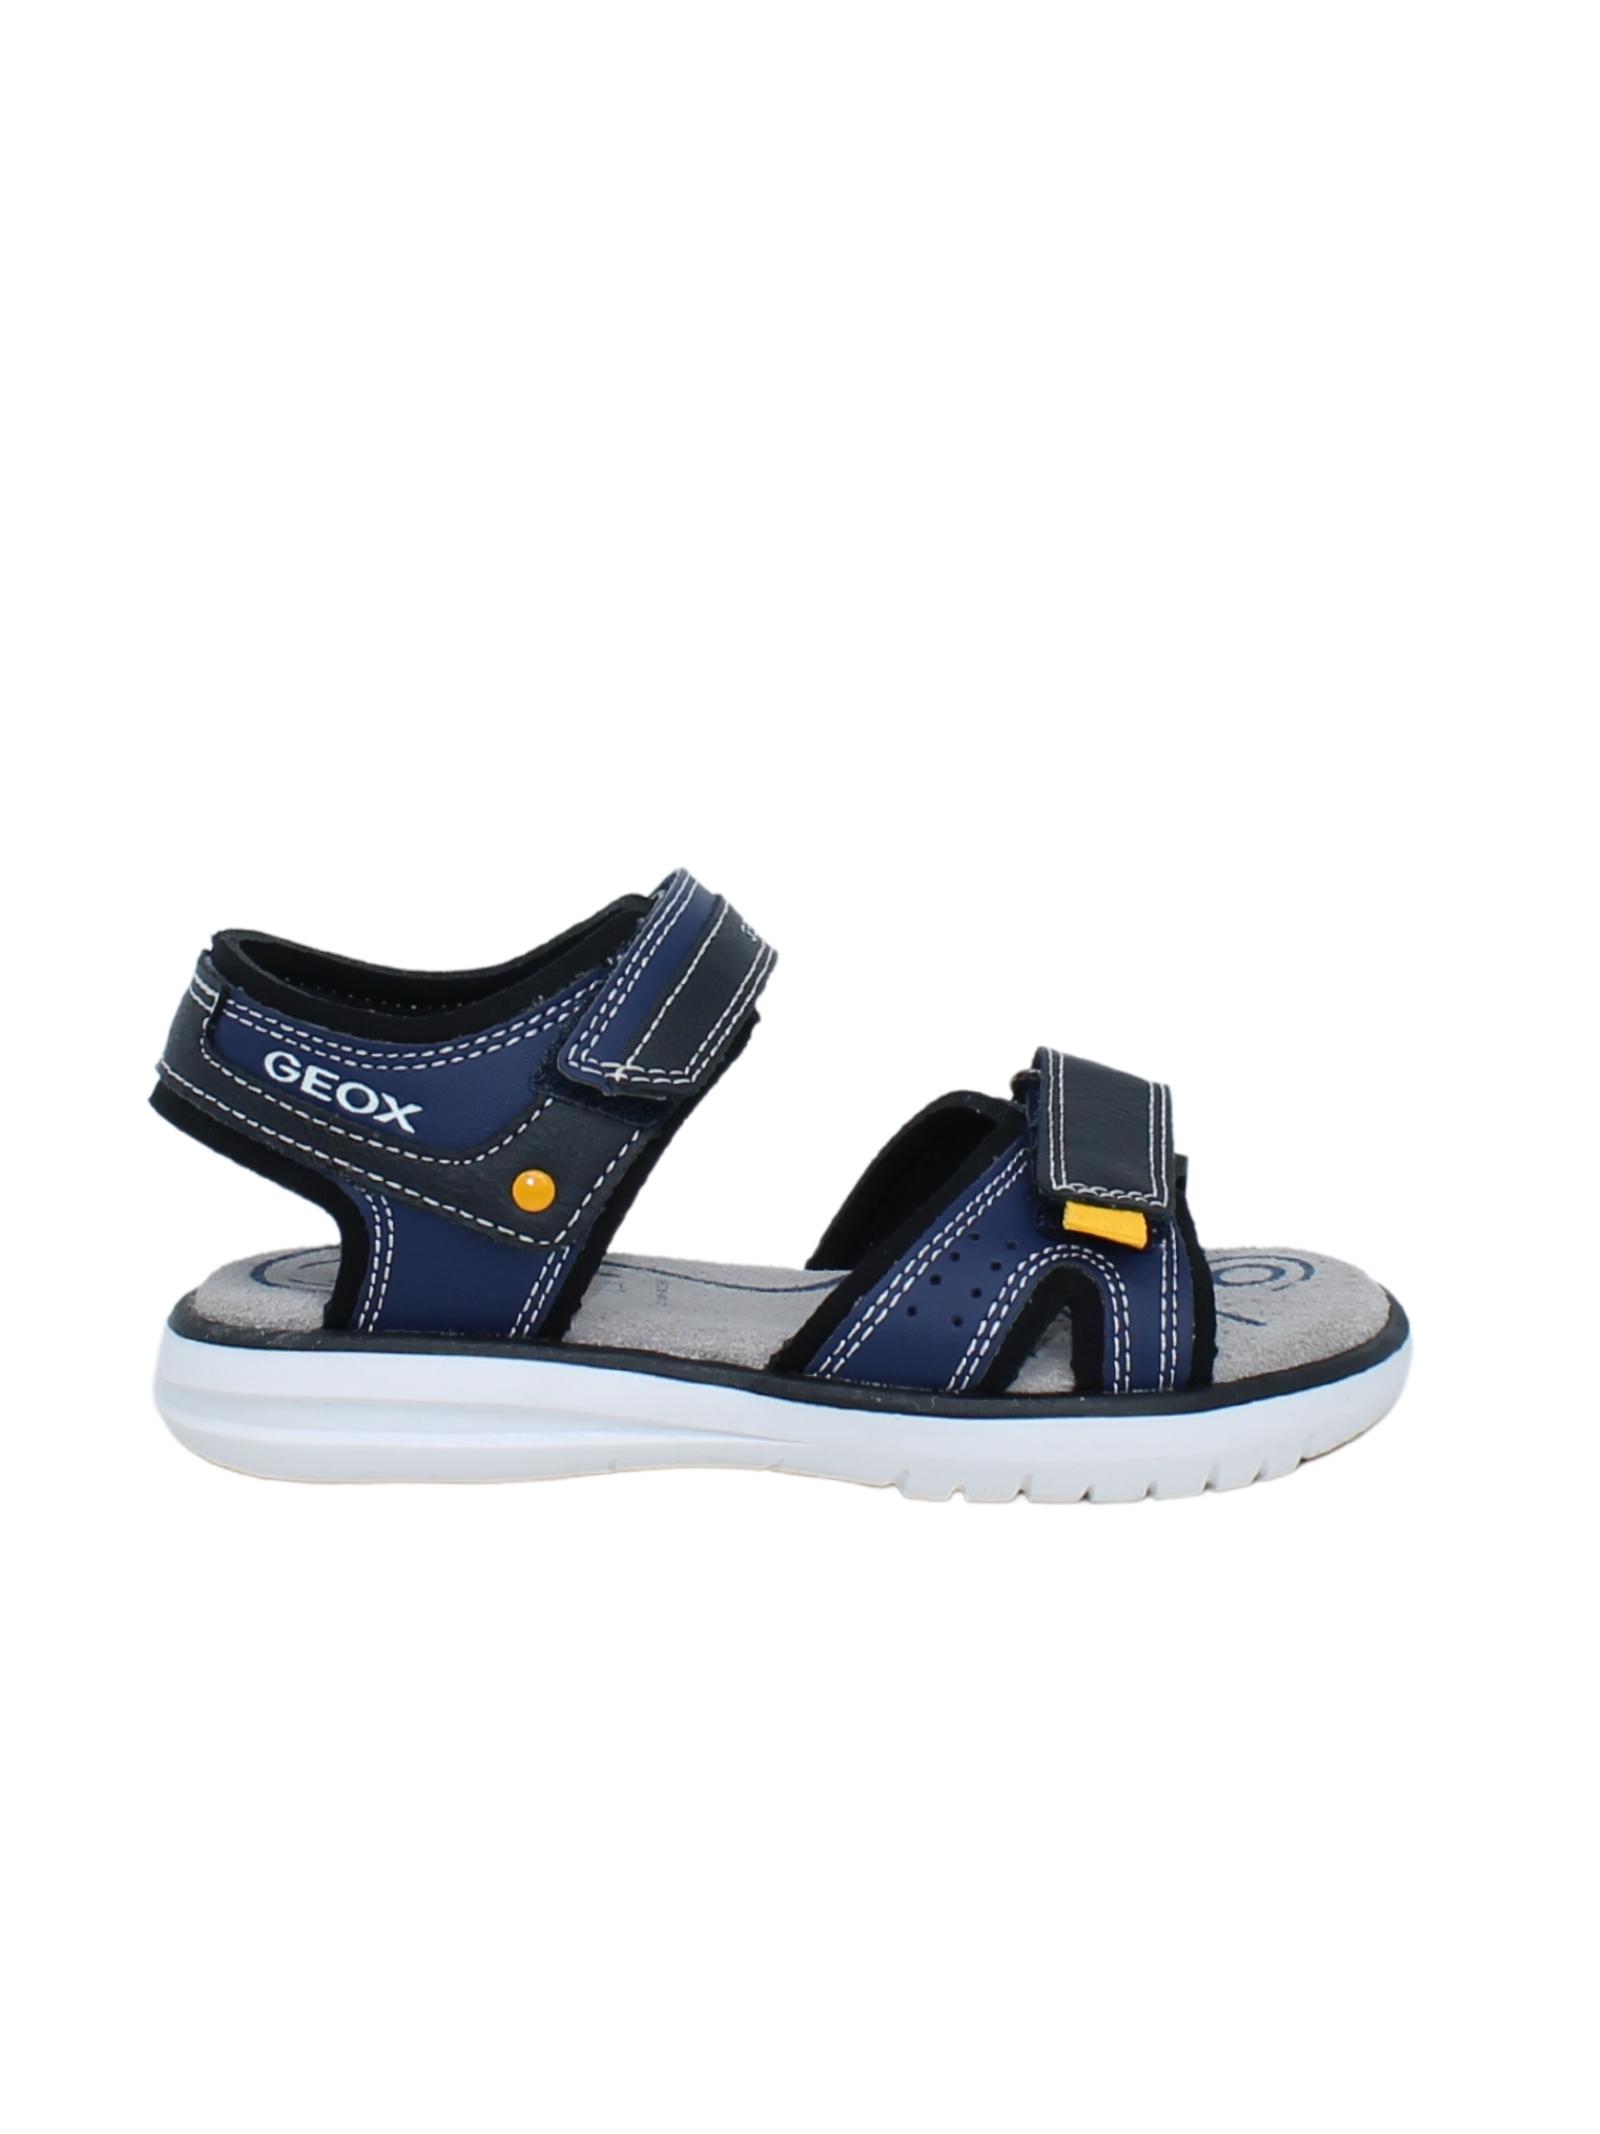 Sandalo Bambino Blu GEOX KIDS | Sandali | J15DRA015BUC0657